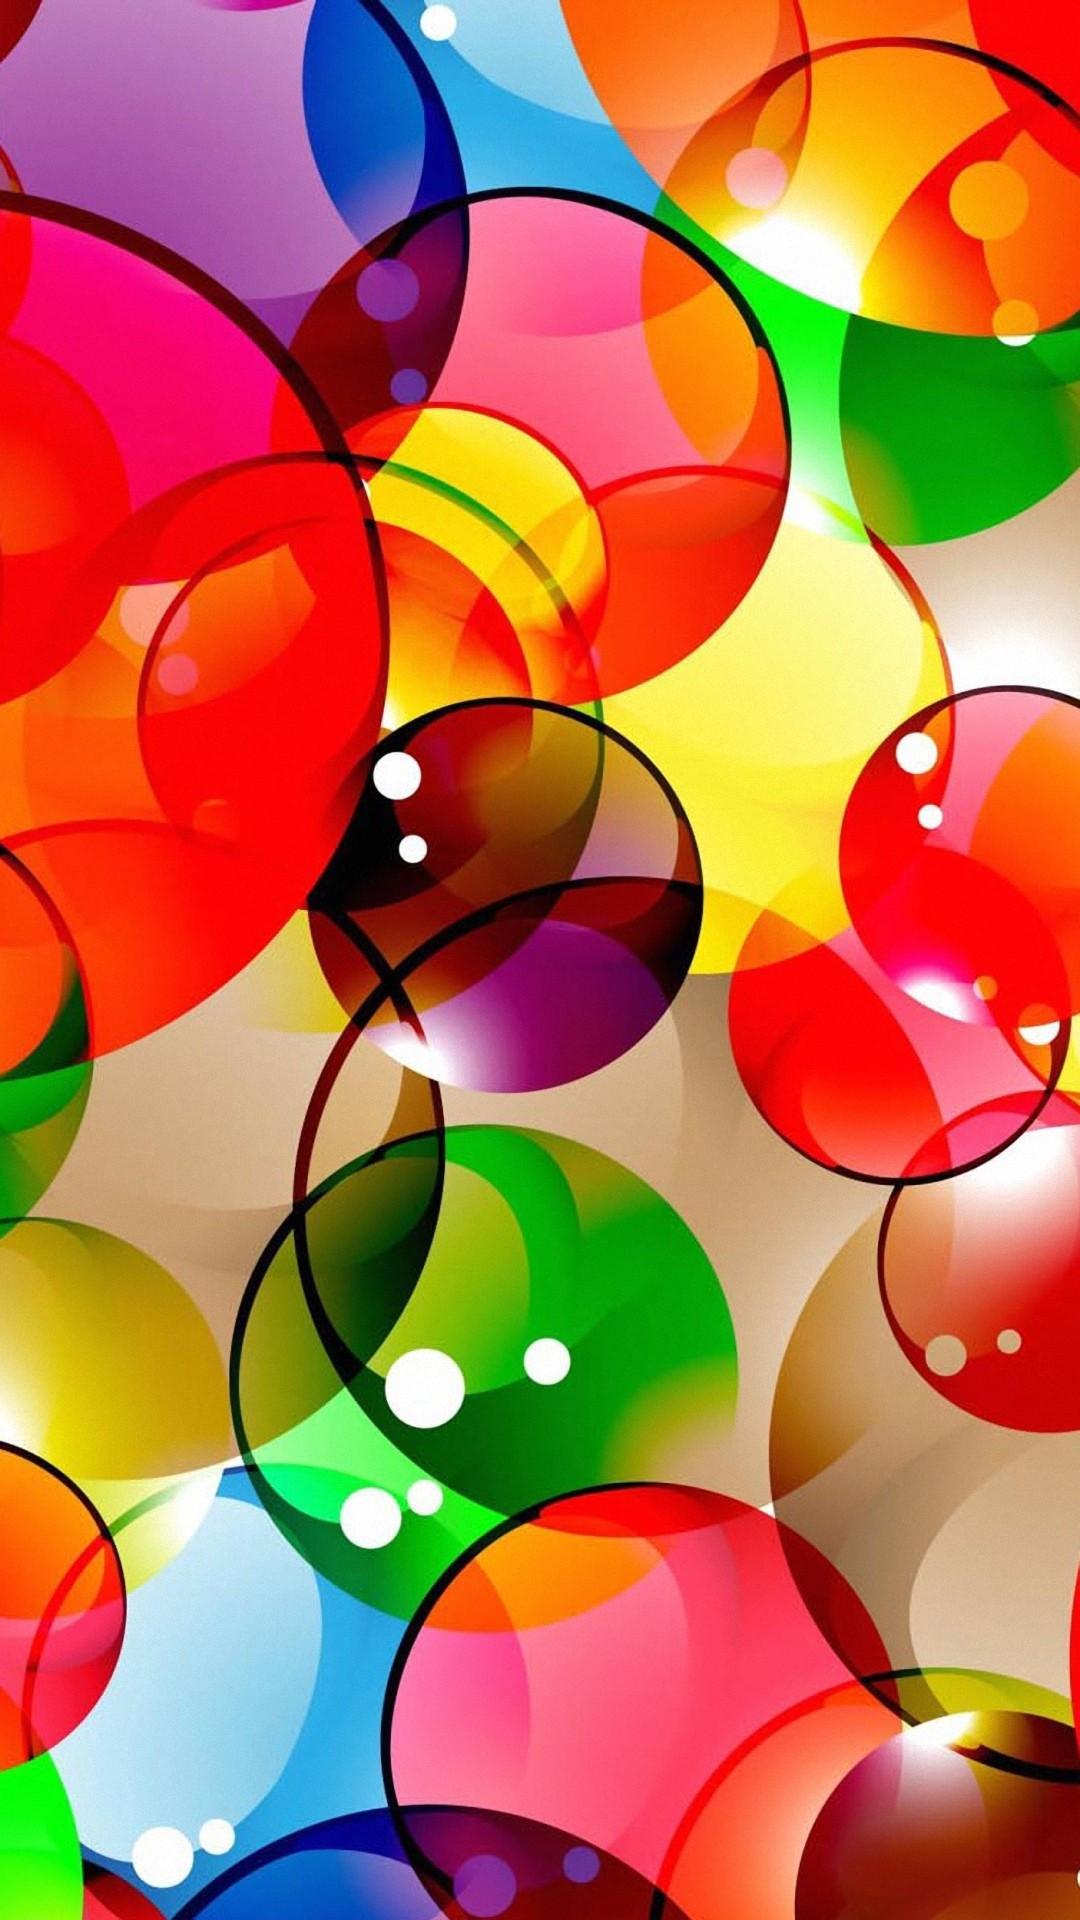 A colorful circle pattern